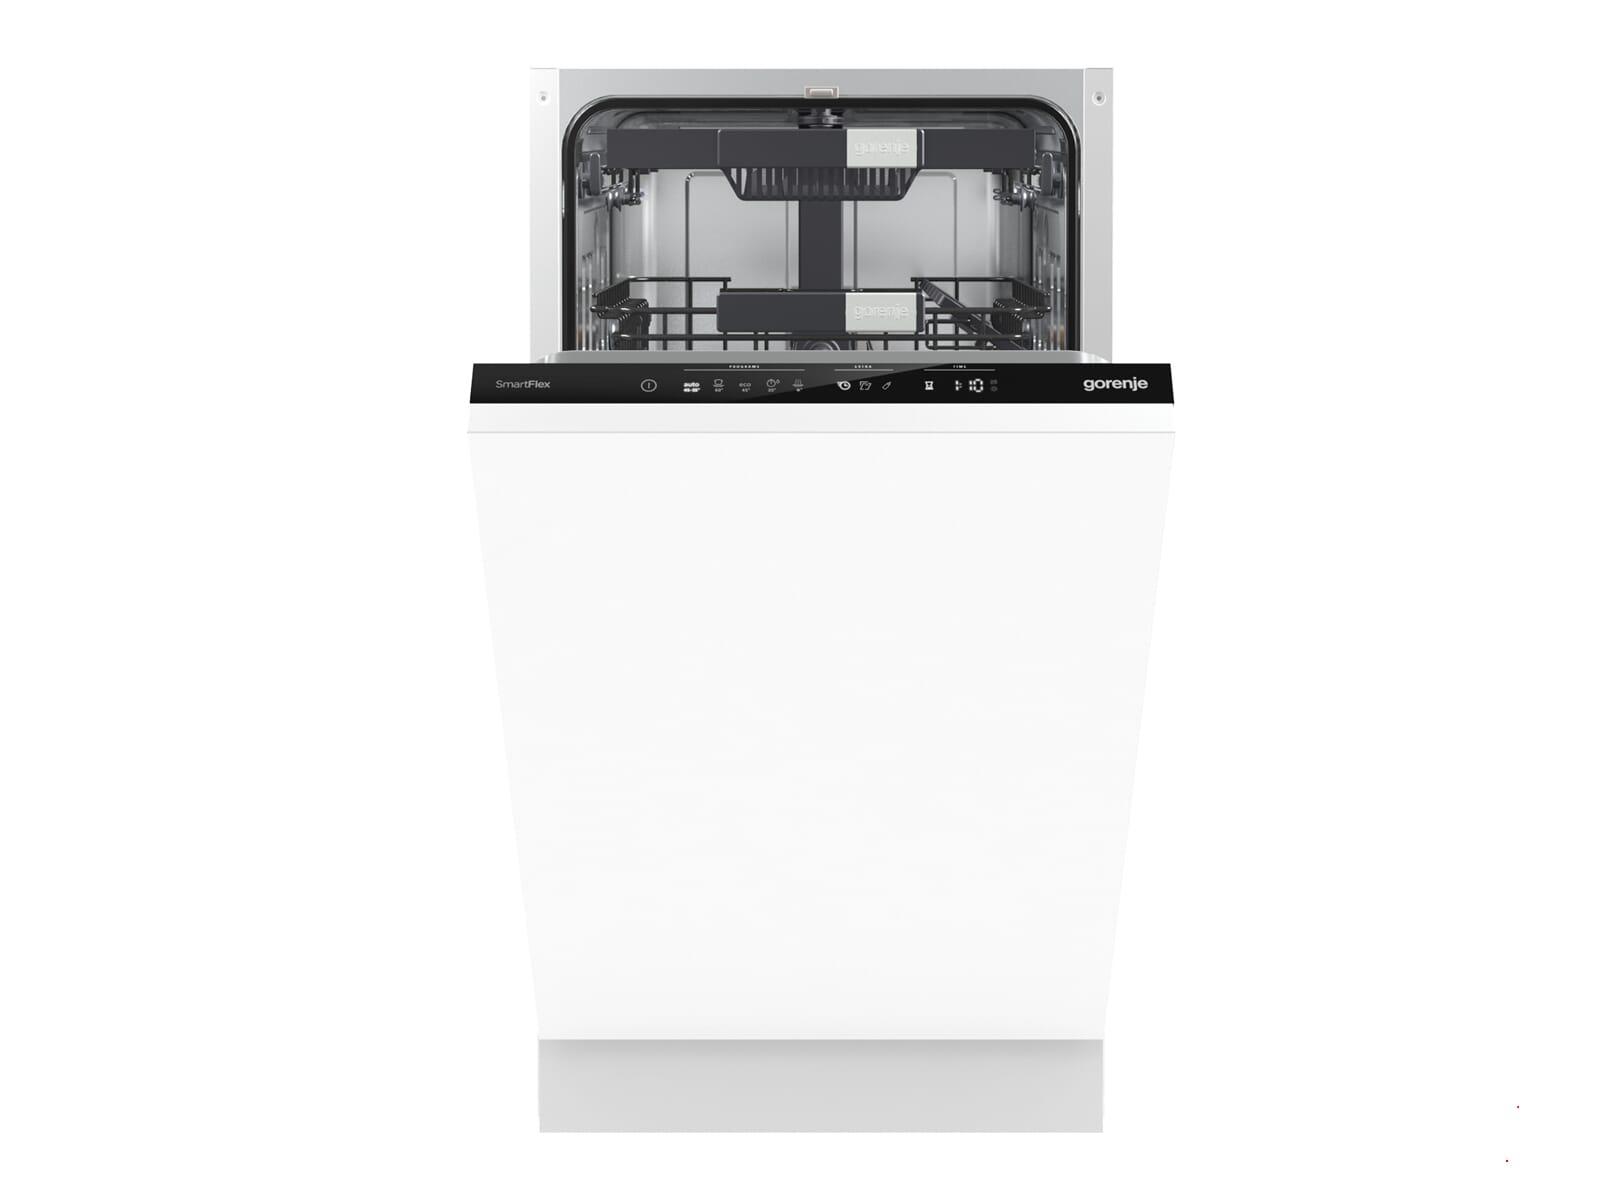 Smeg Kühlschrank Zu Kalt : Gorenje gv 57210 vollintegrierbarer einbaugeschirrspüler